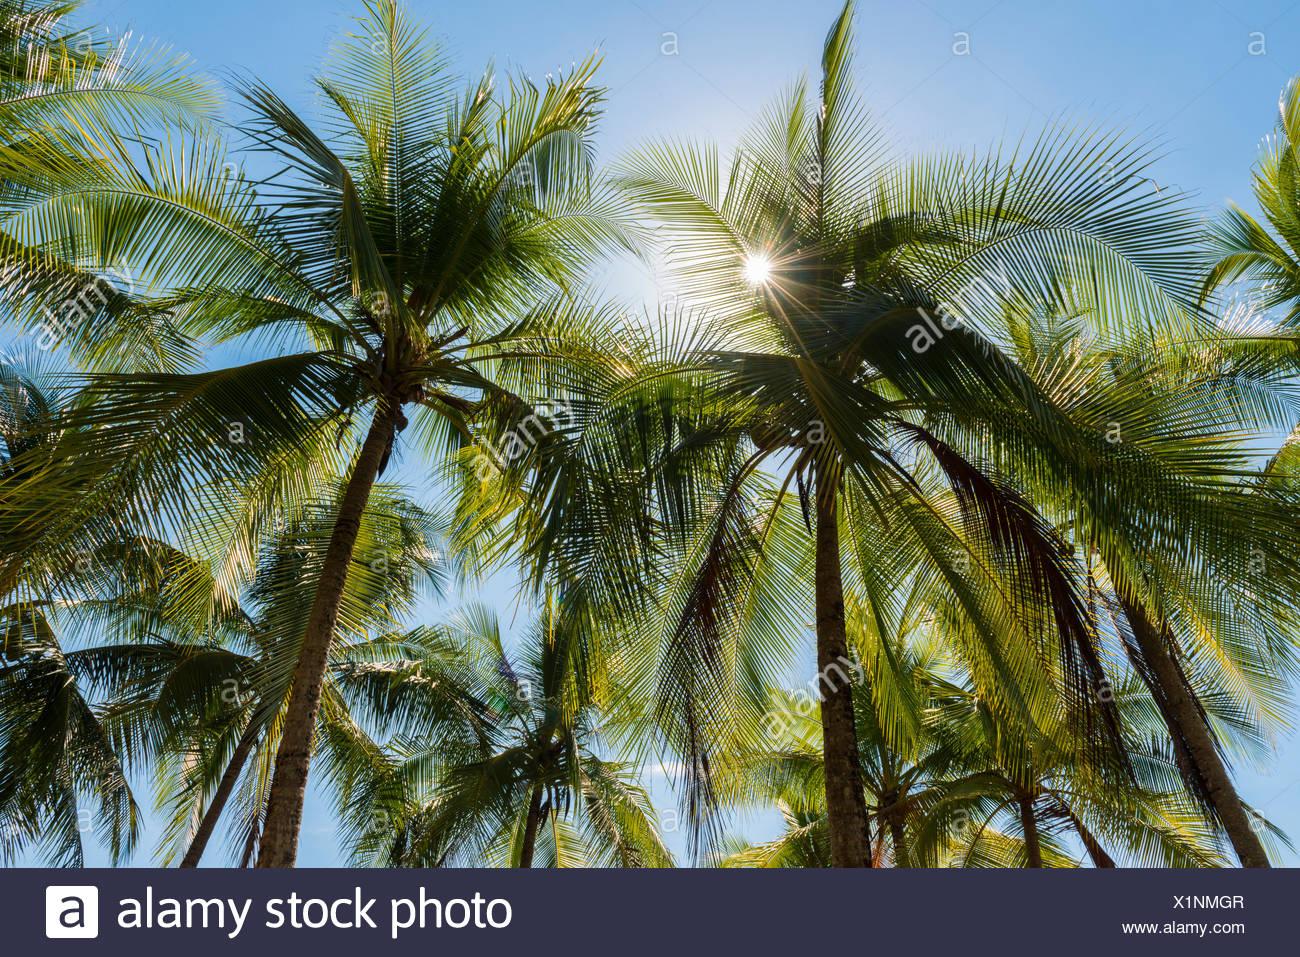 Sun shines through palm trees, Costa Rica, Central America - Stock Image